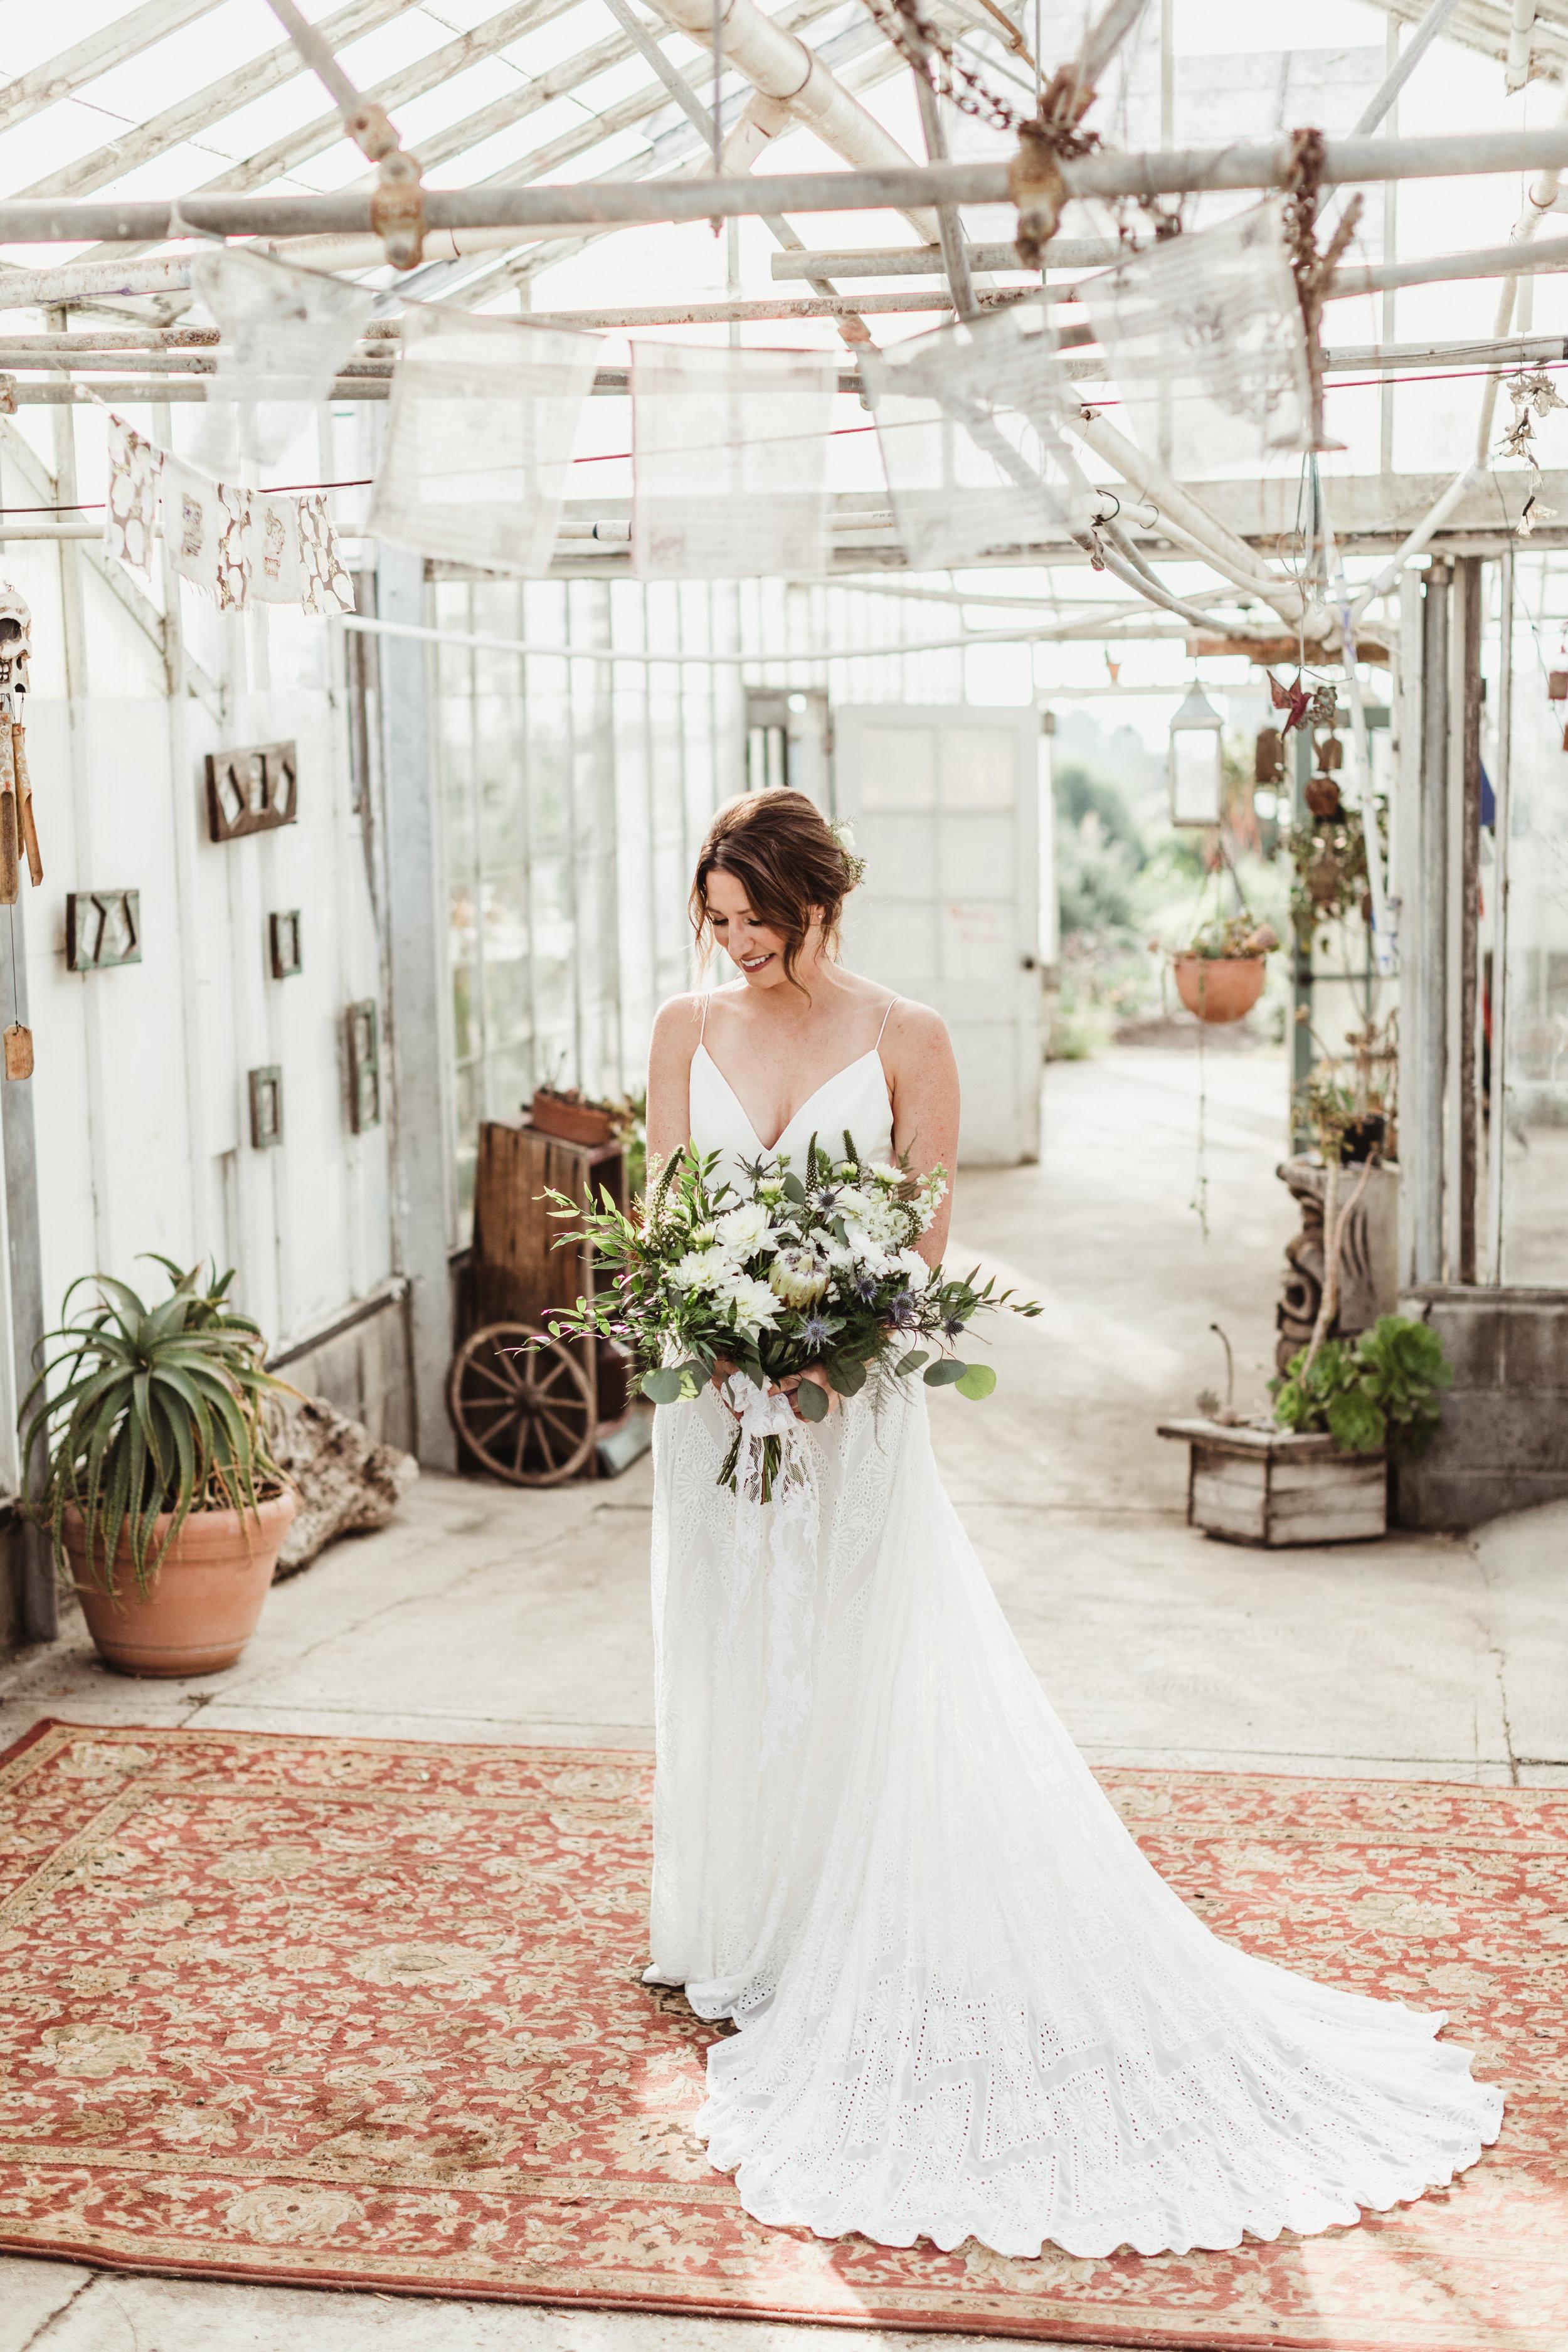 Jamie_English_Photography_JordanErik_Dos_Pueblos_Orchid_Wedding_Santa_Barbara_Fall2018-216.jpg